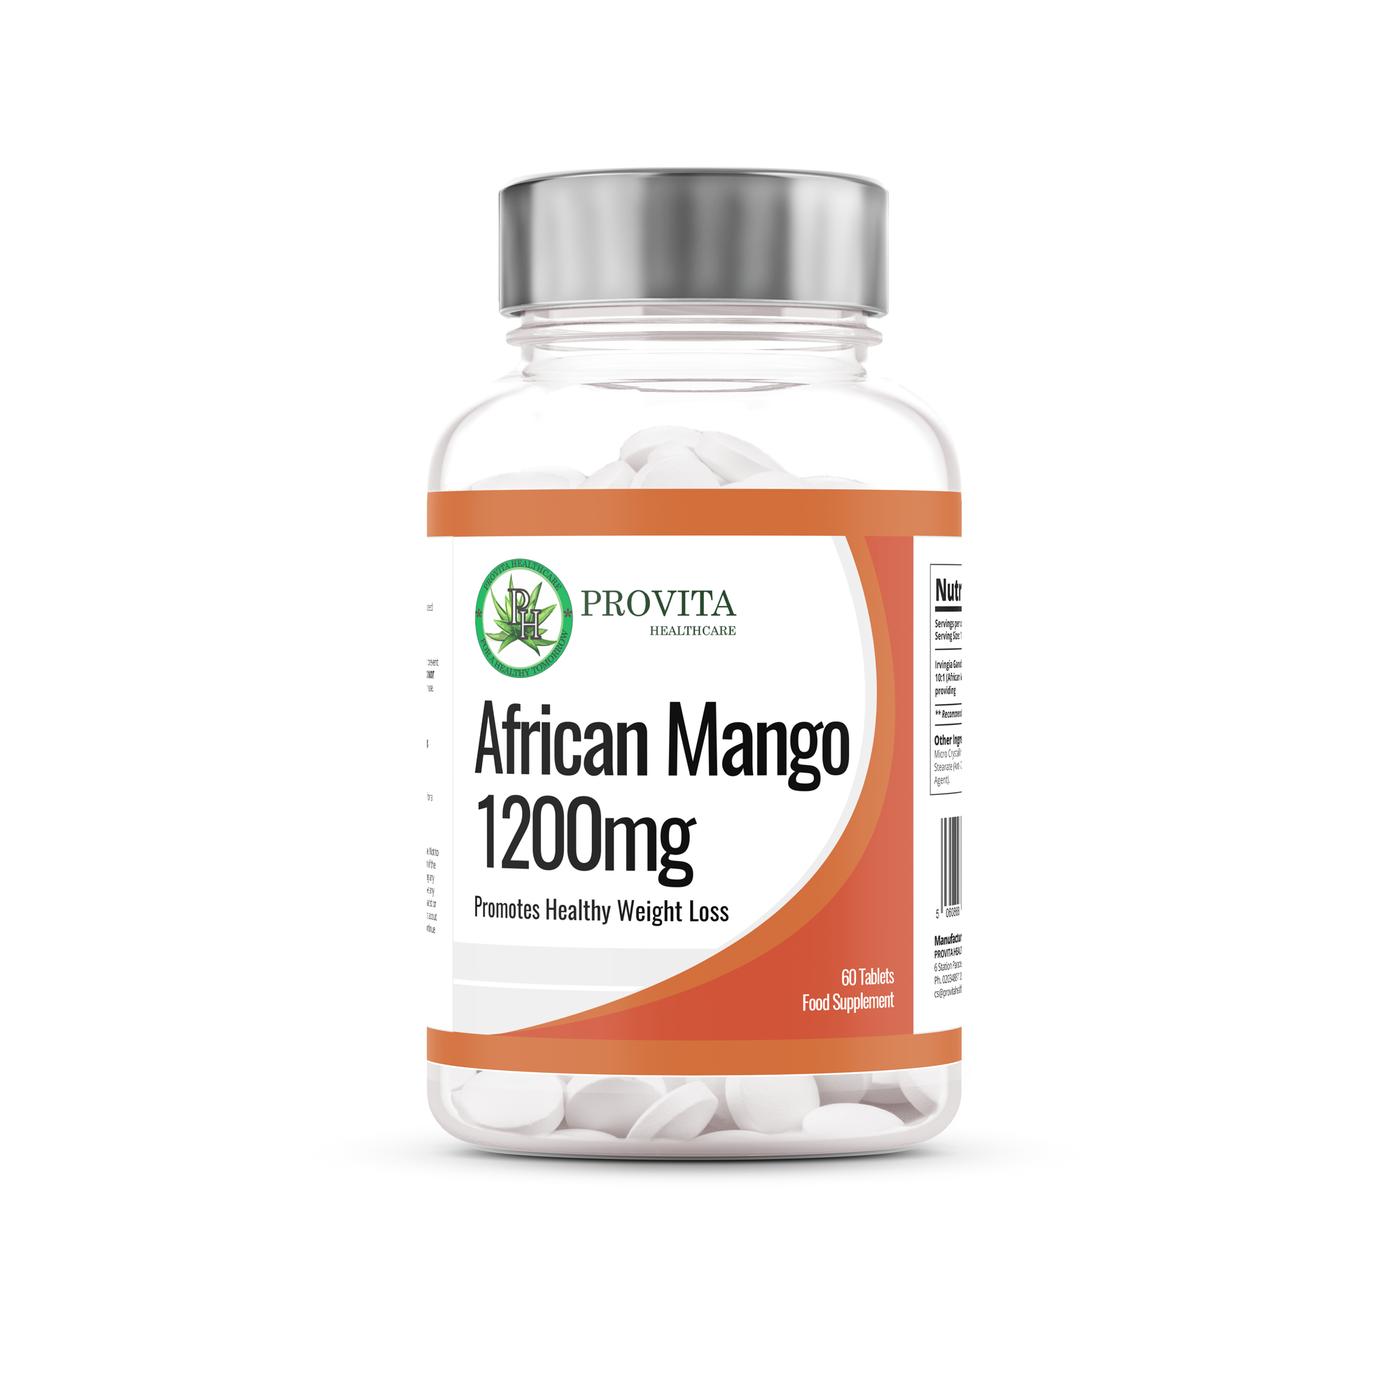 African Mango 1200mg